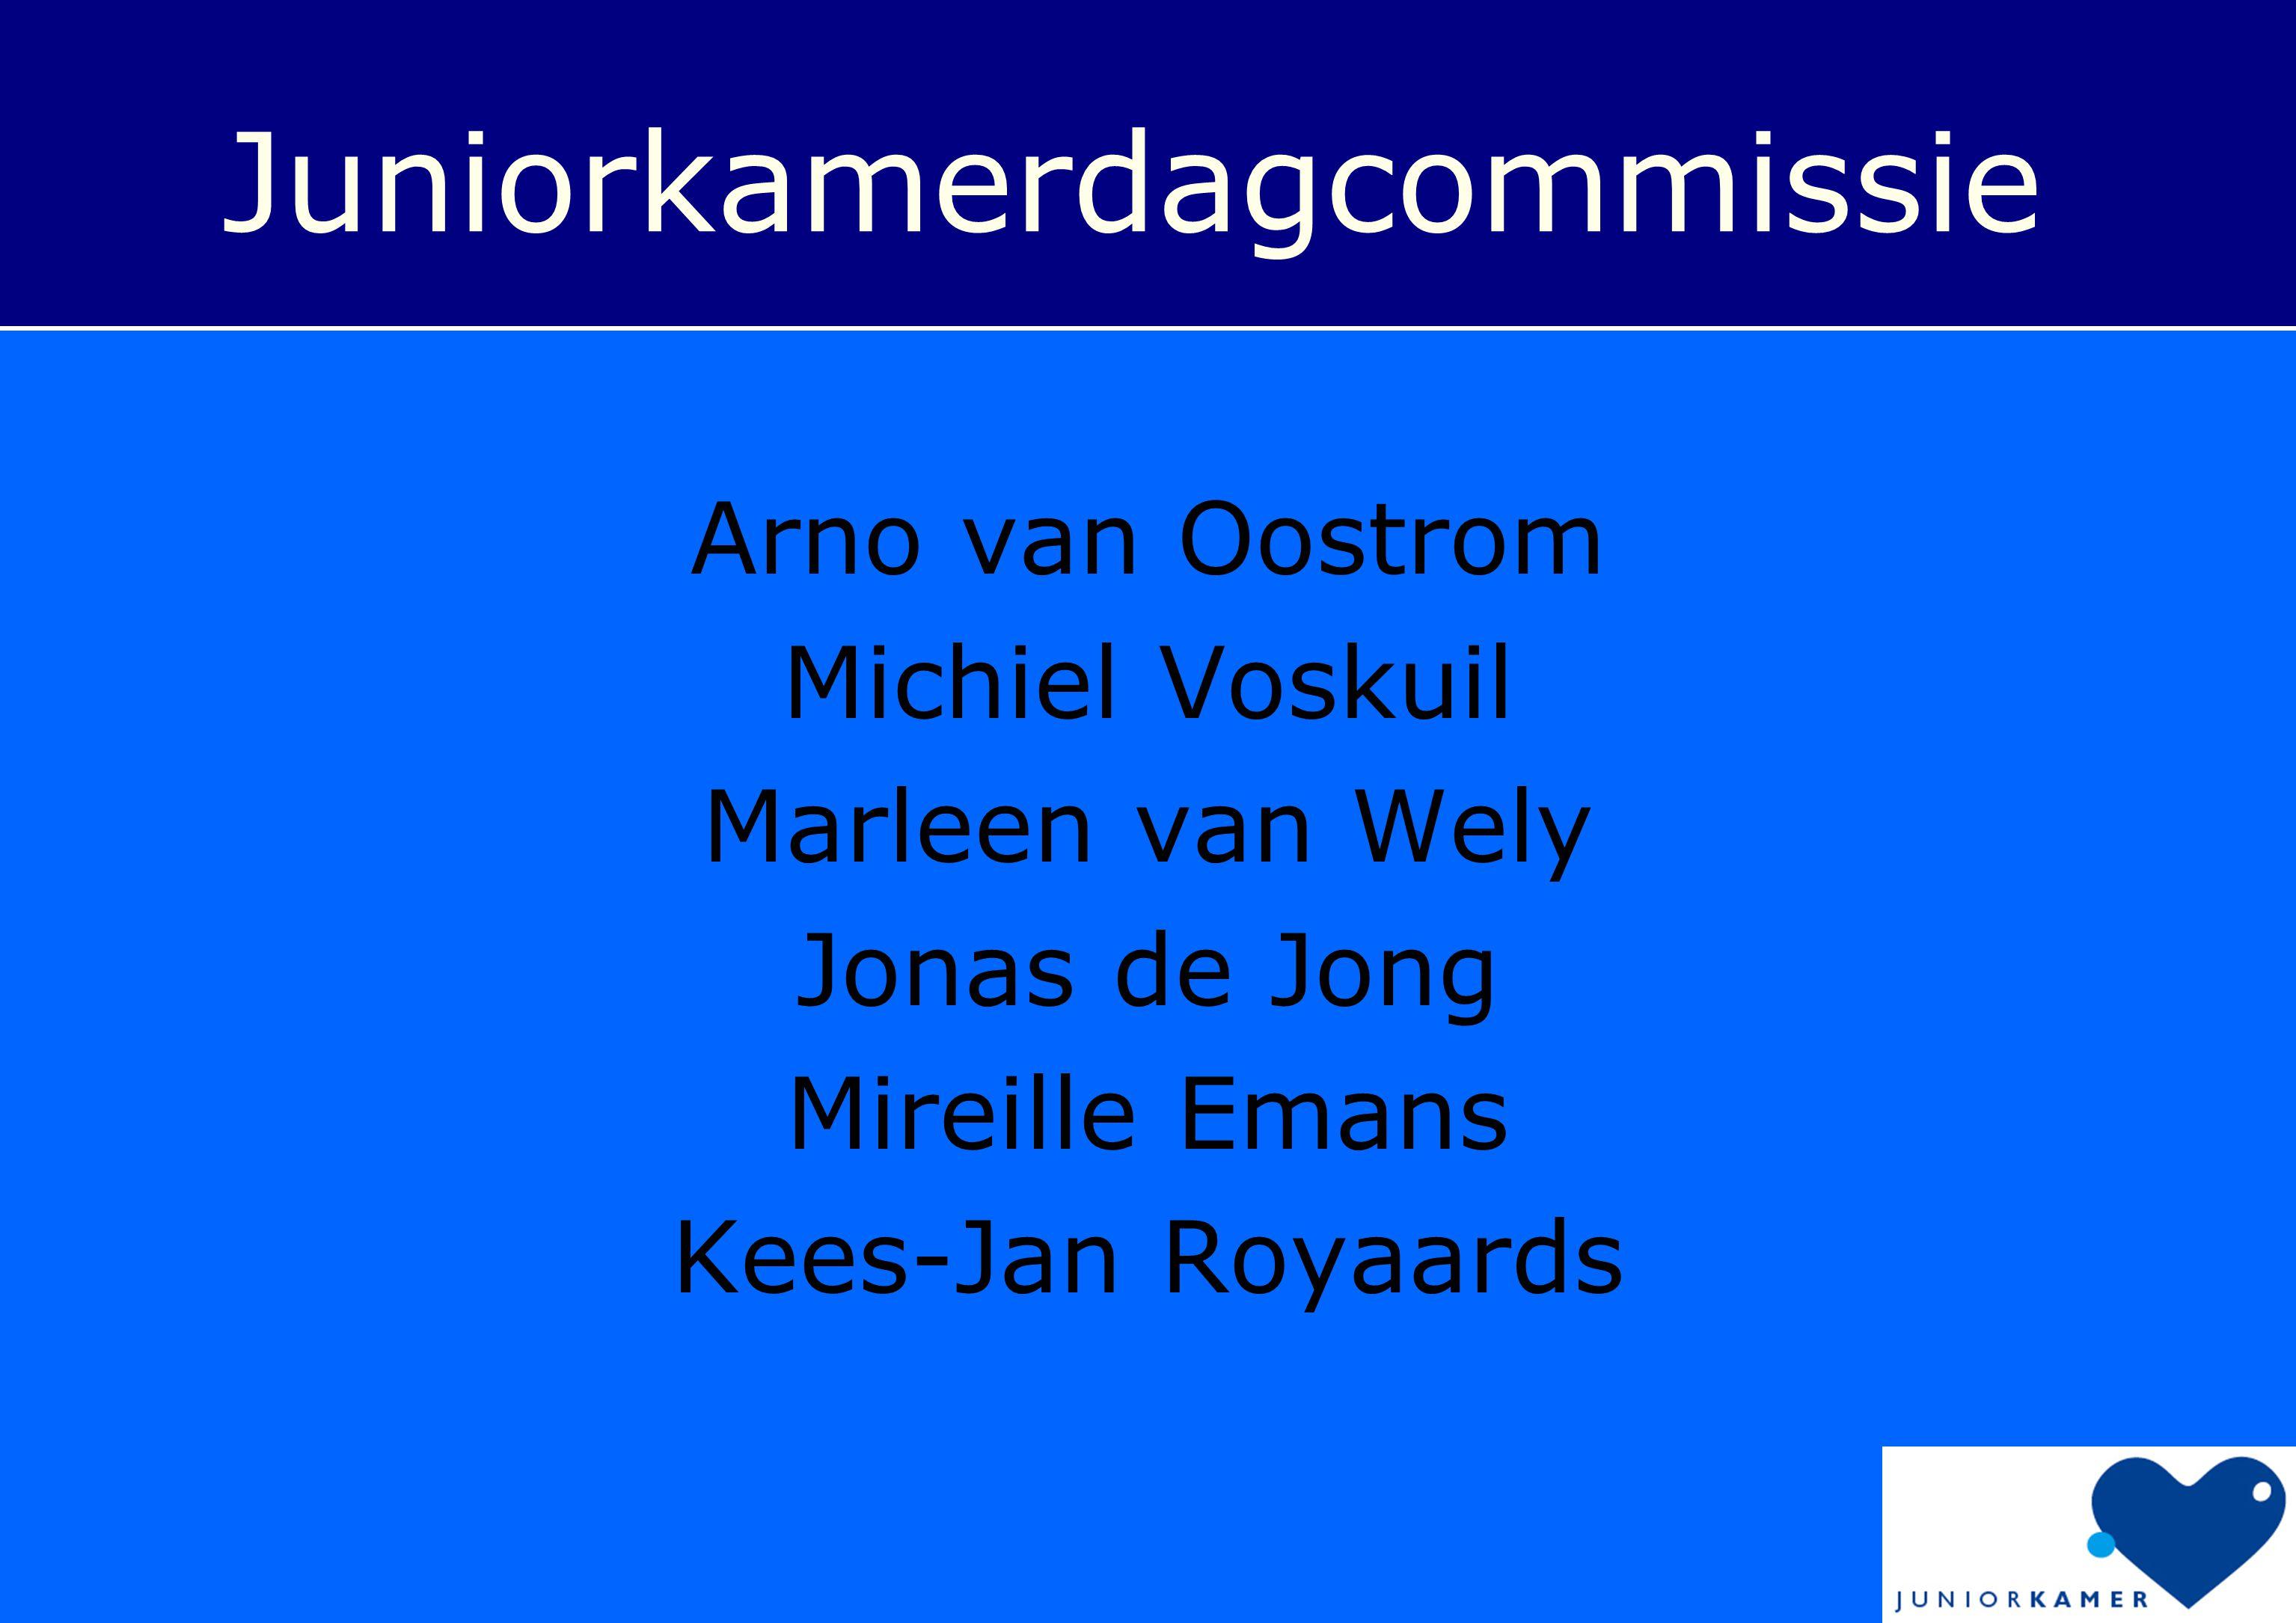 Juniorkamerdagcommissie